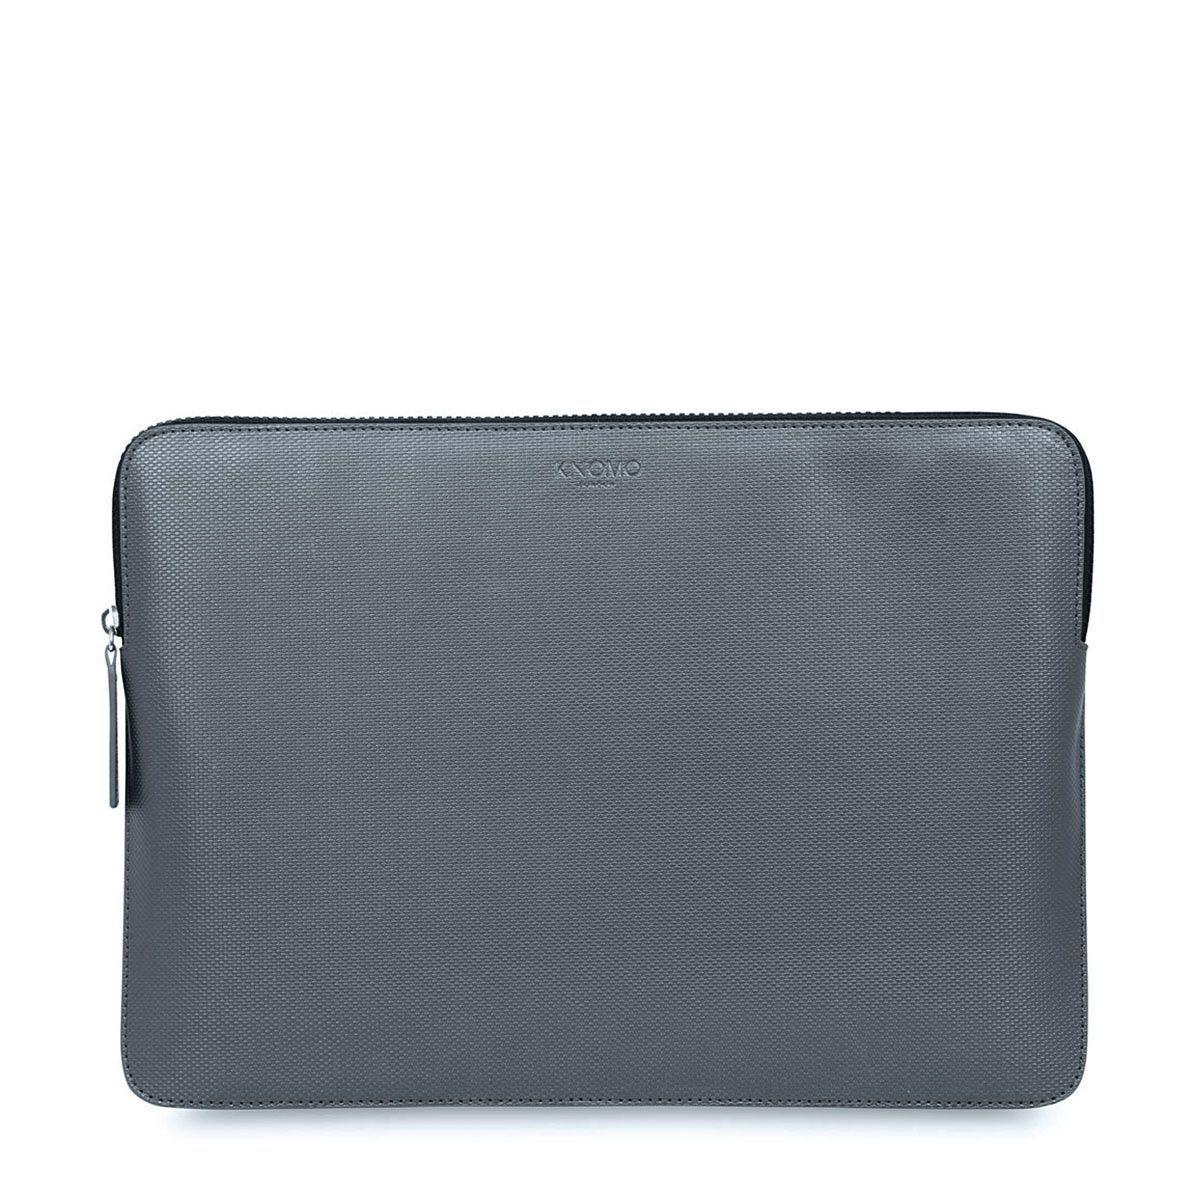 Knomo Laptop Sleeve Embossed Silver 13 inch